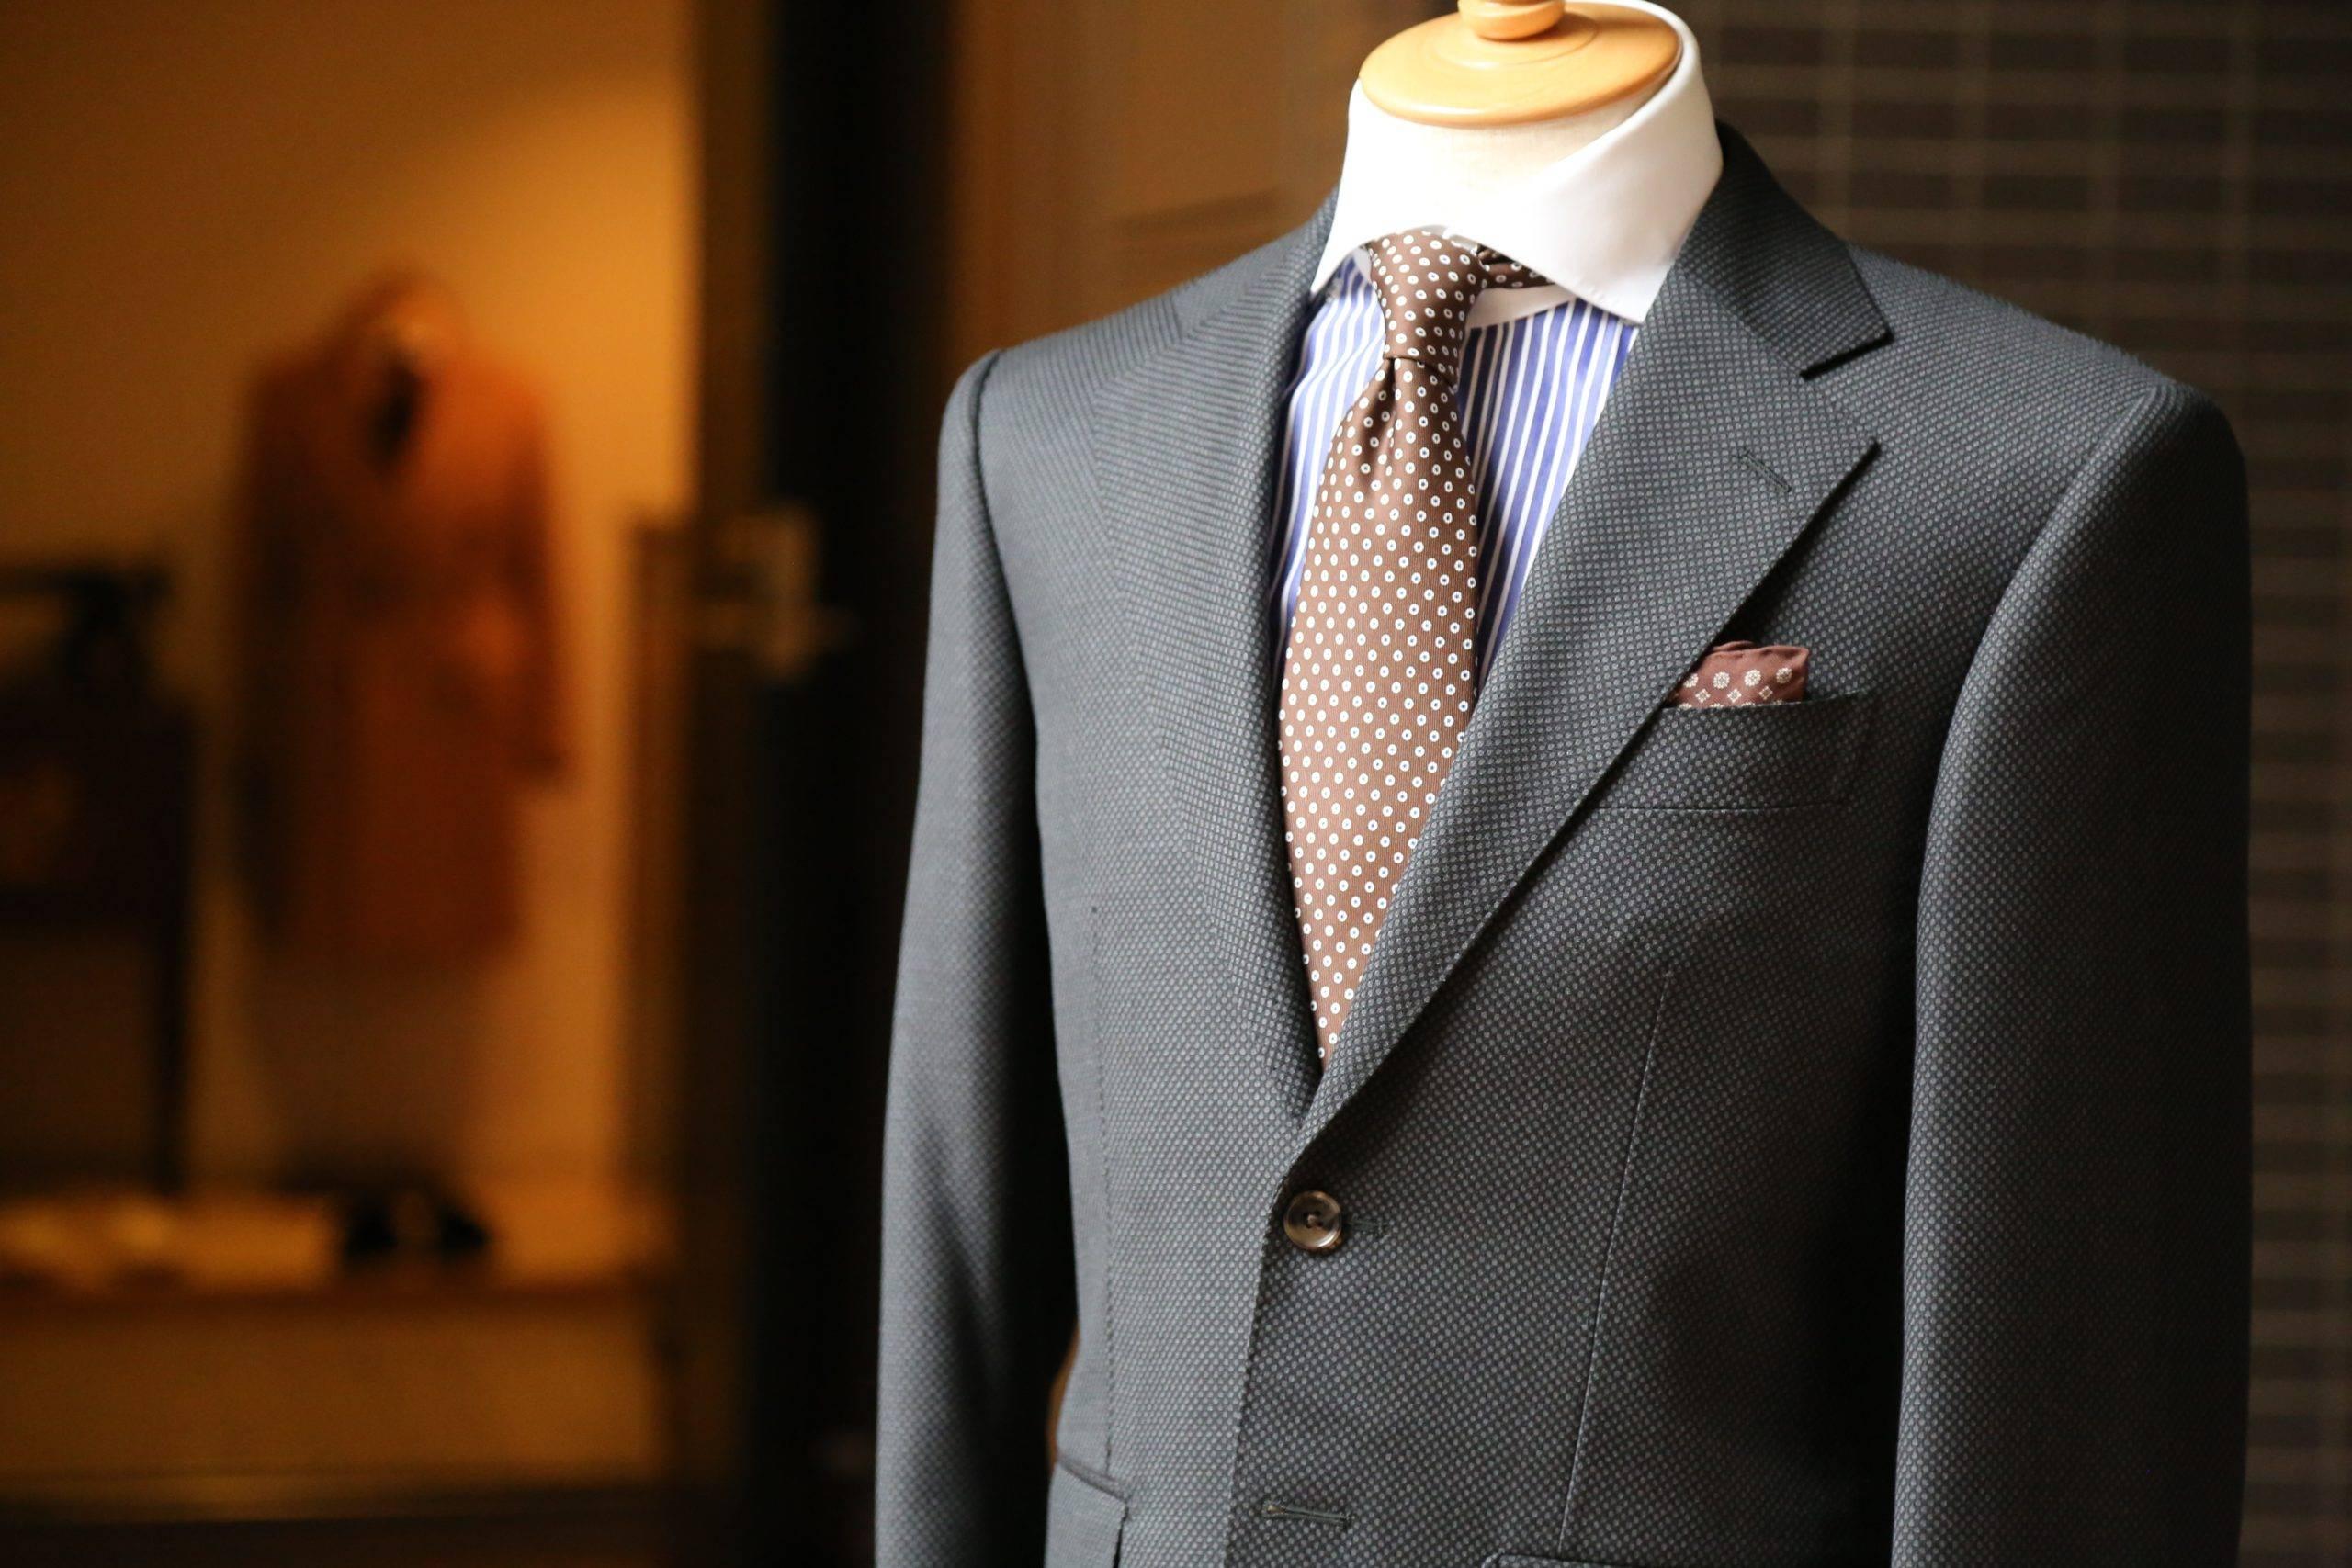 Grey suit with brown polka dots tie